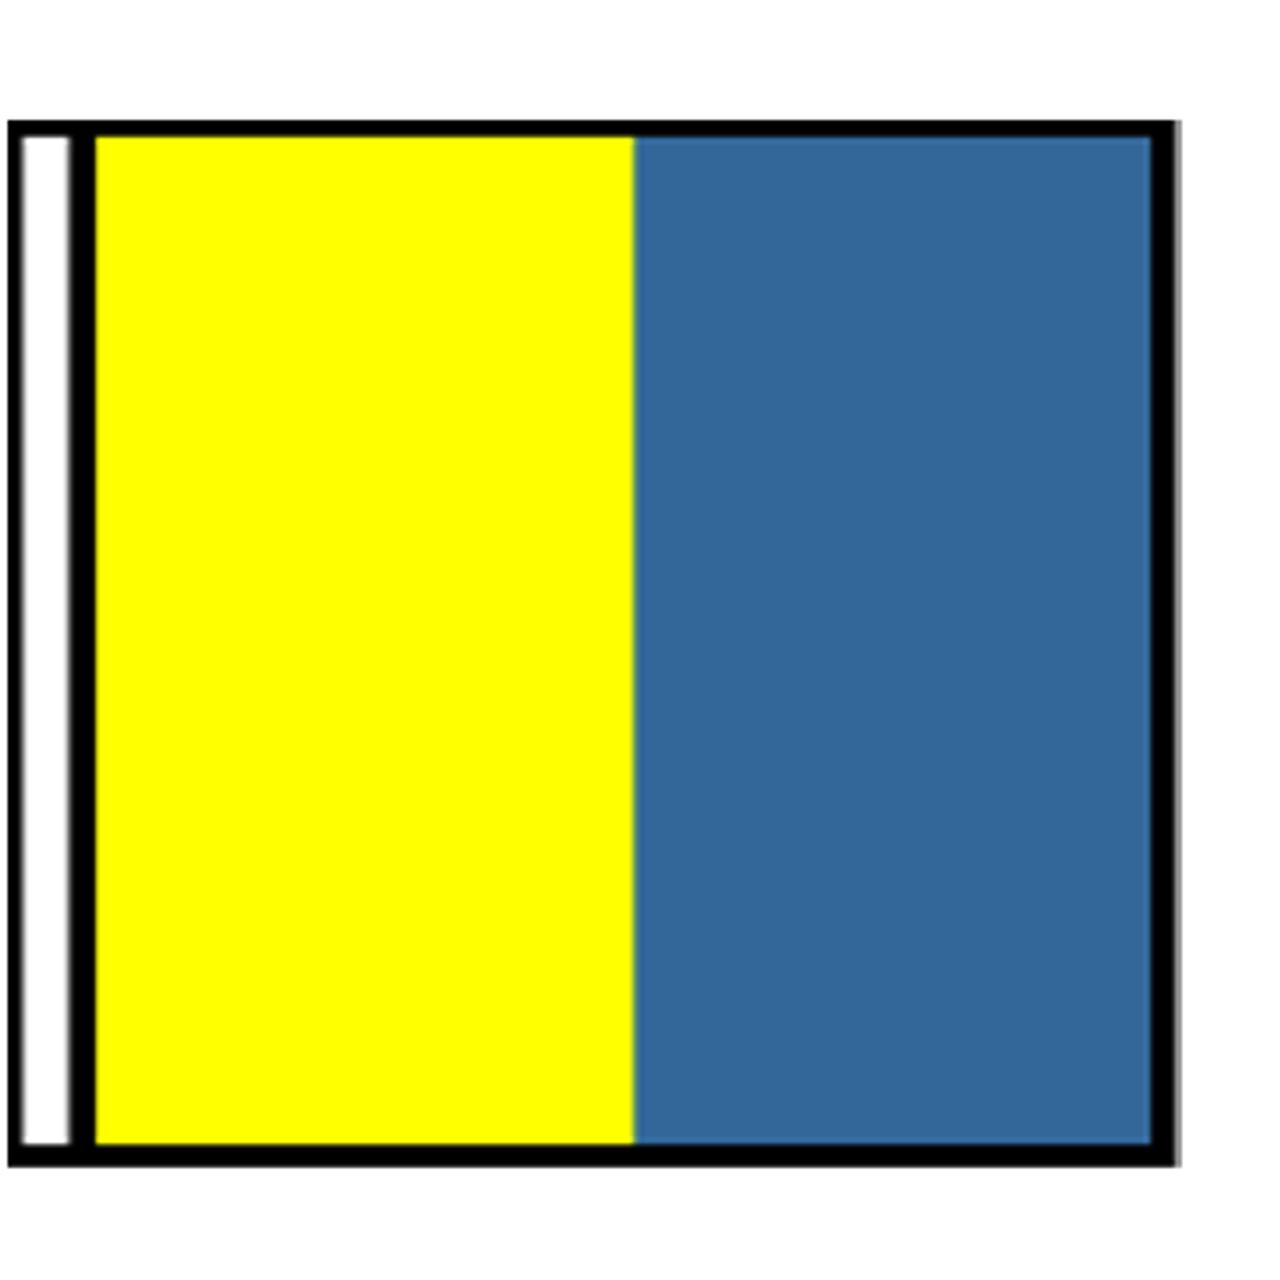 Kilo Desire to Communicate Flag